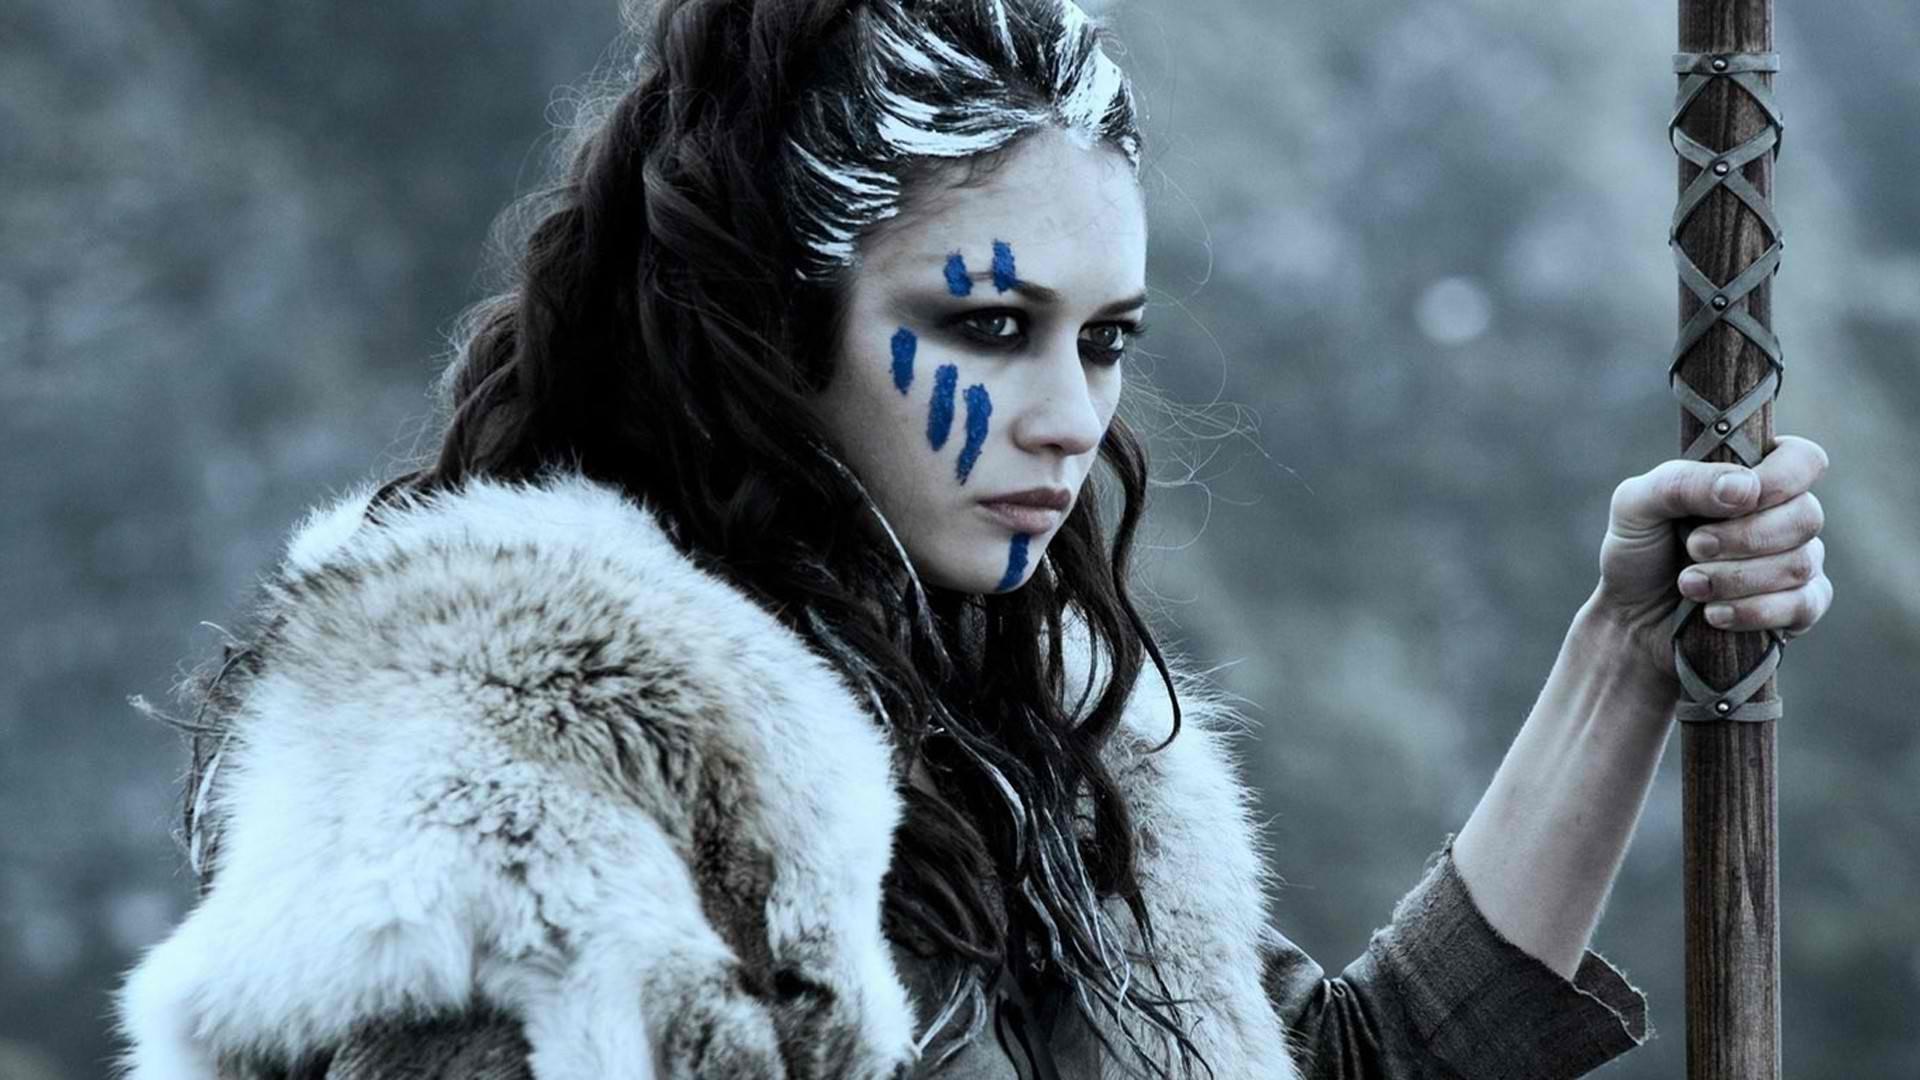 Best Wallpaper Movie Warrior - monochrome-winter-movies-fashion-warrior-fur-Celtic-Olga-Kurylenko-Centurion-1920x1080-px-fictional-character-601962  2018_845651.jpg